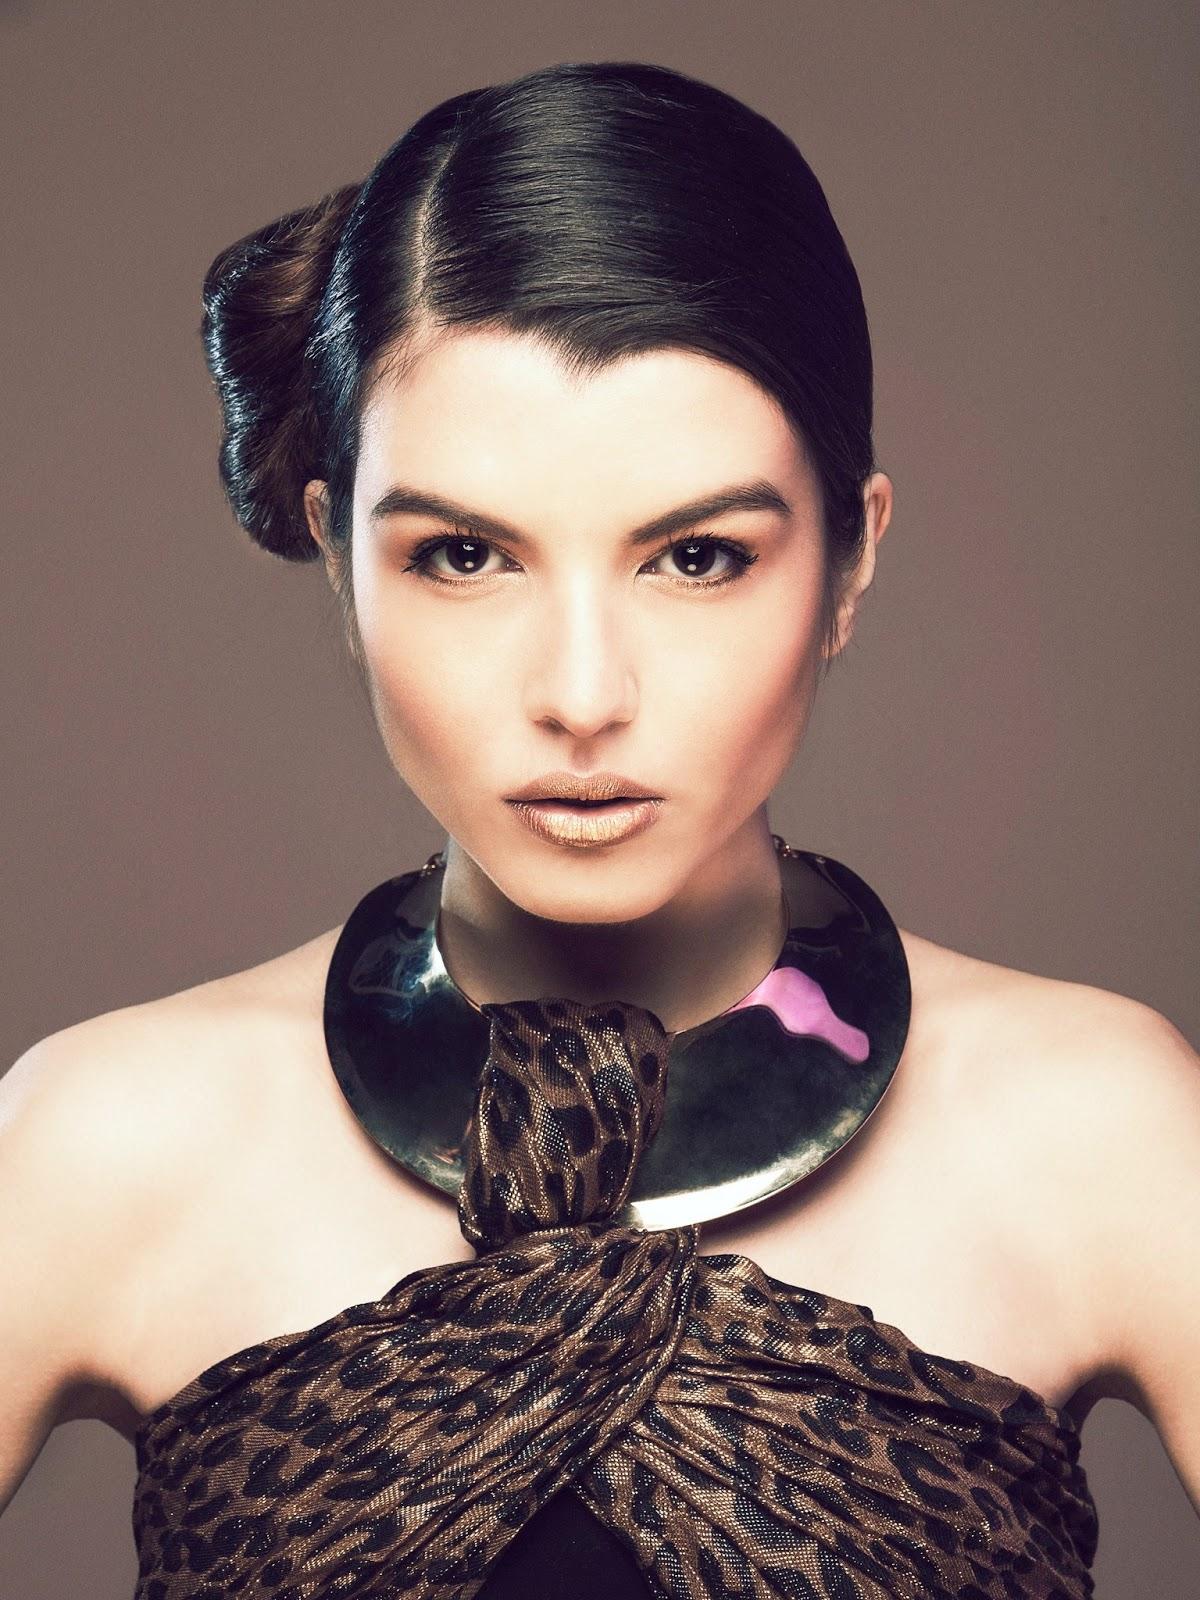 [$9.99/Pack] Freetress Equal Bulgarian Wave - YouTube ...  |Bulgarian Hair Fashion